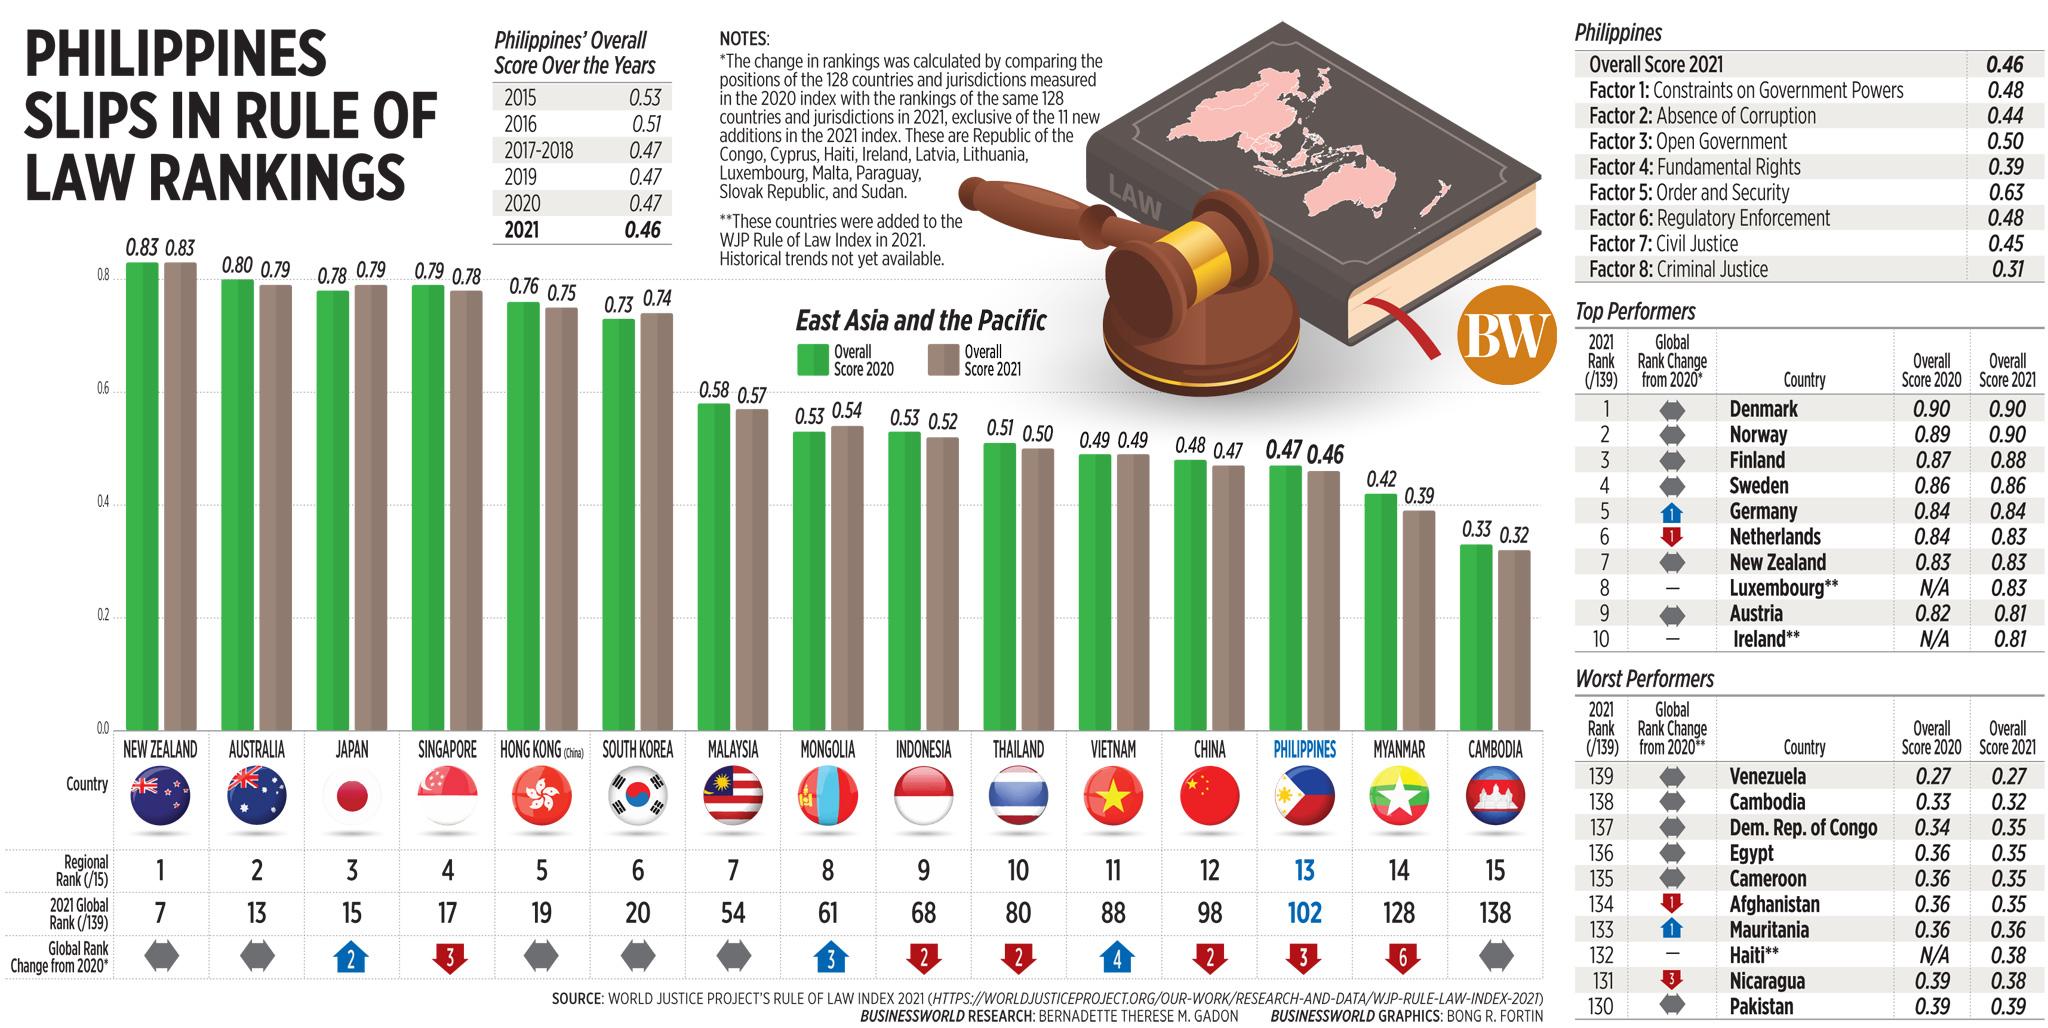 Philippines slips in rule of law rankings